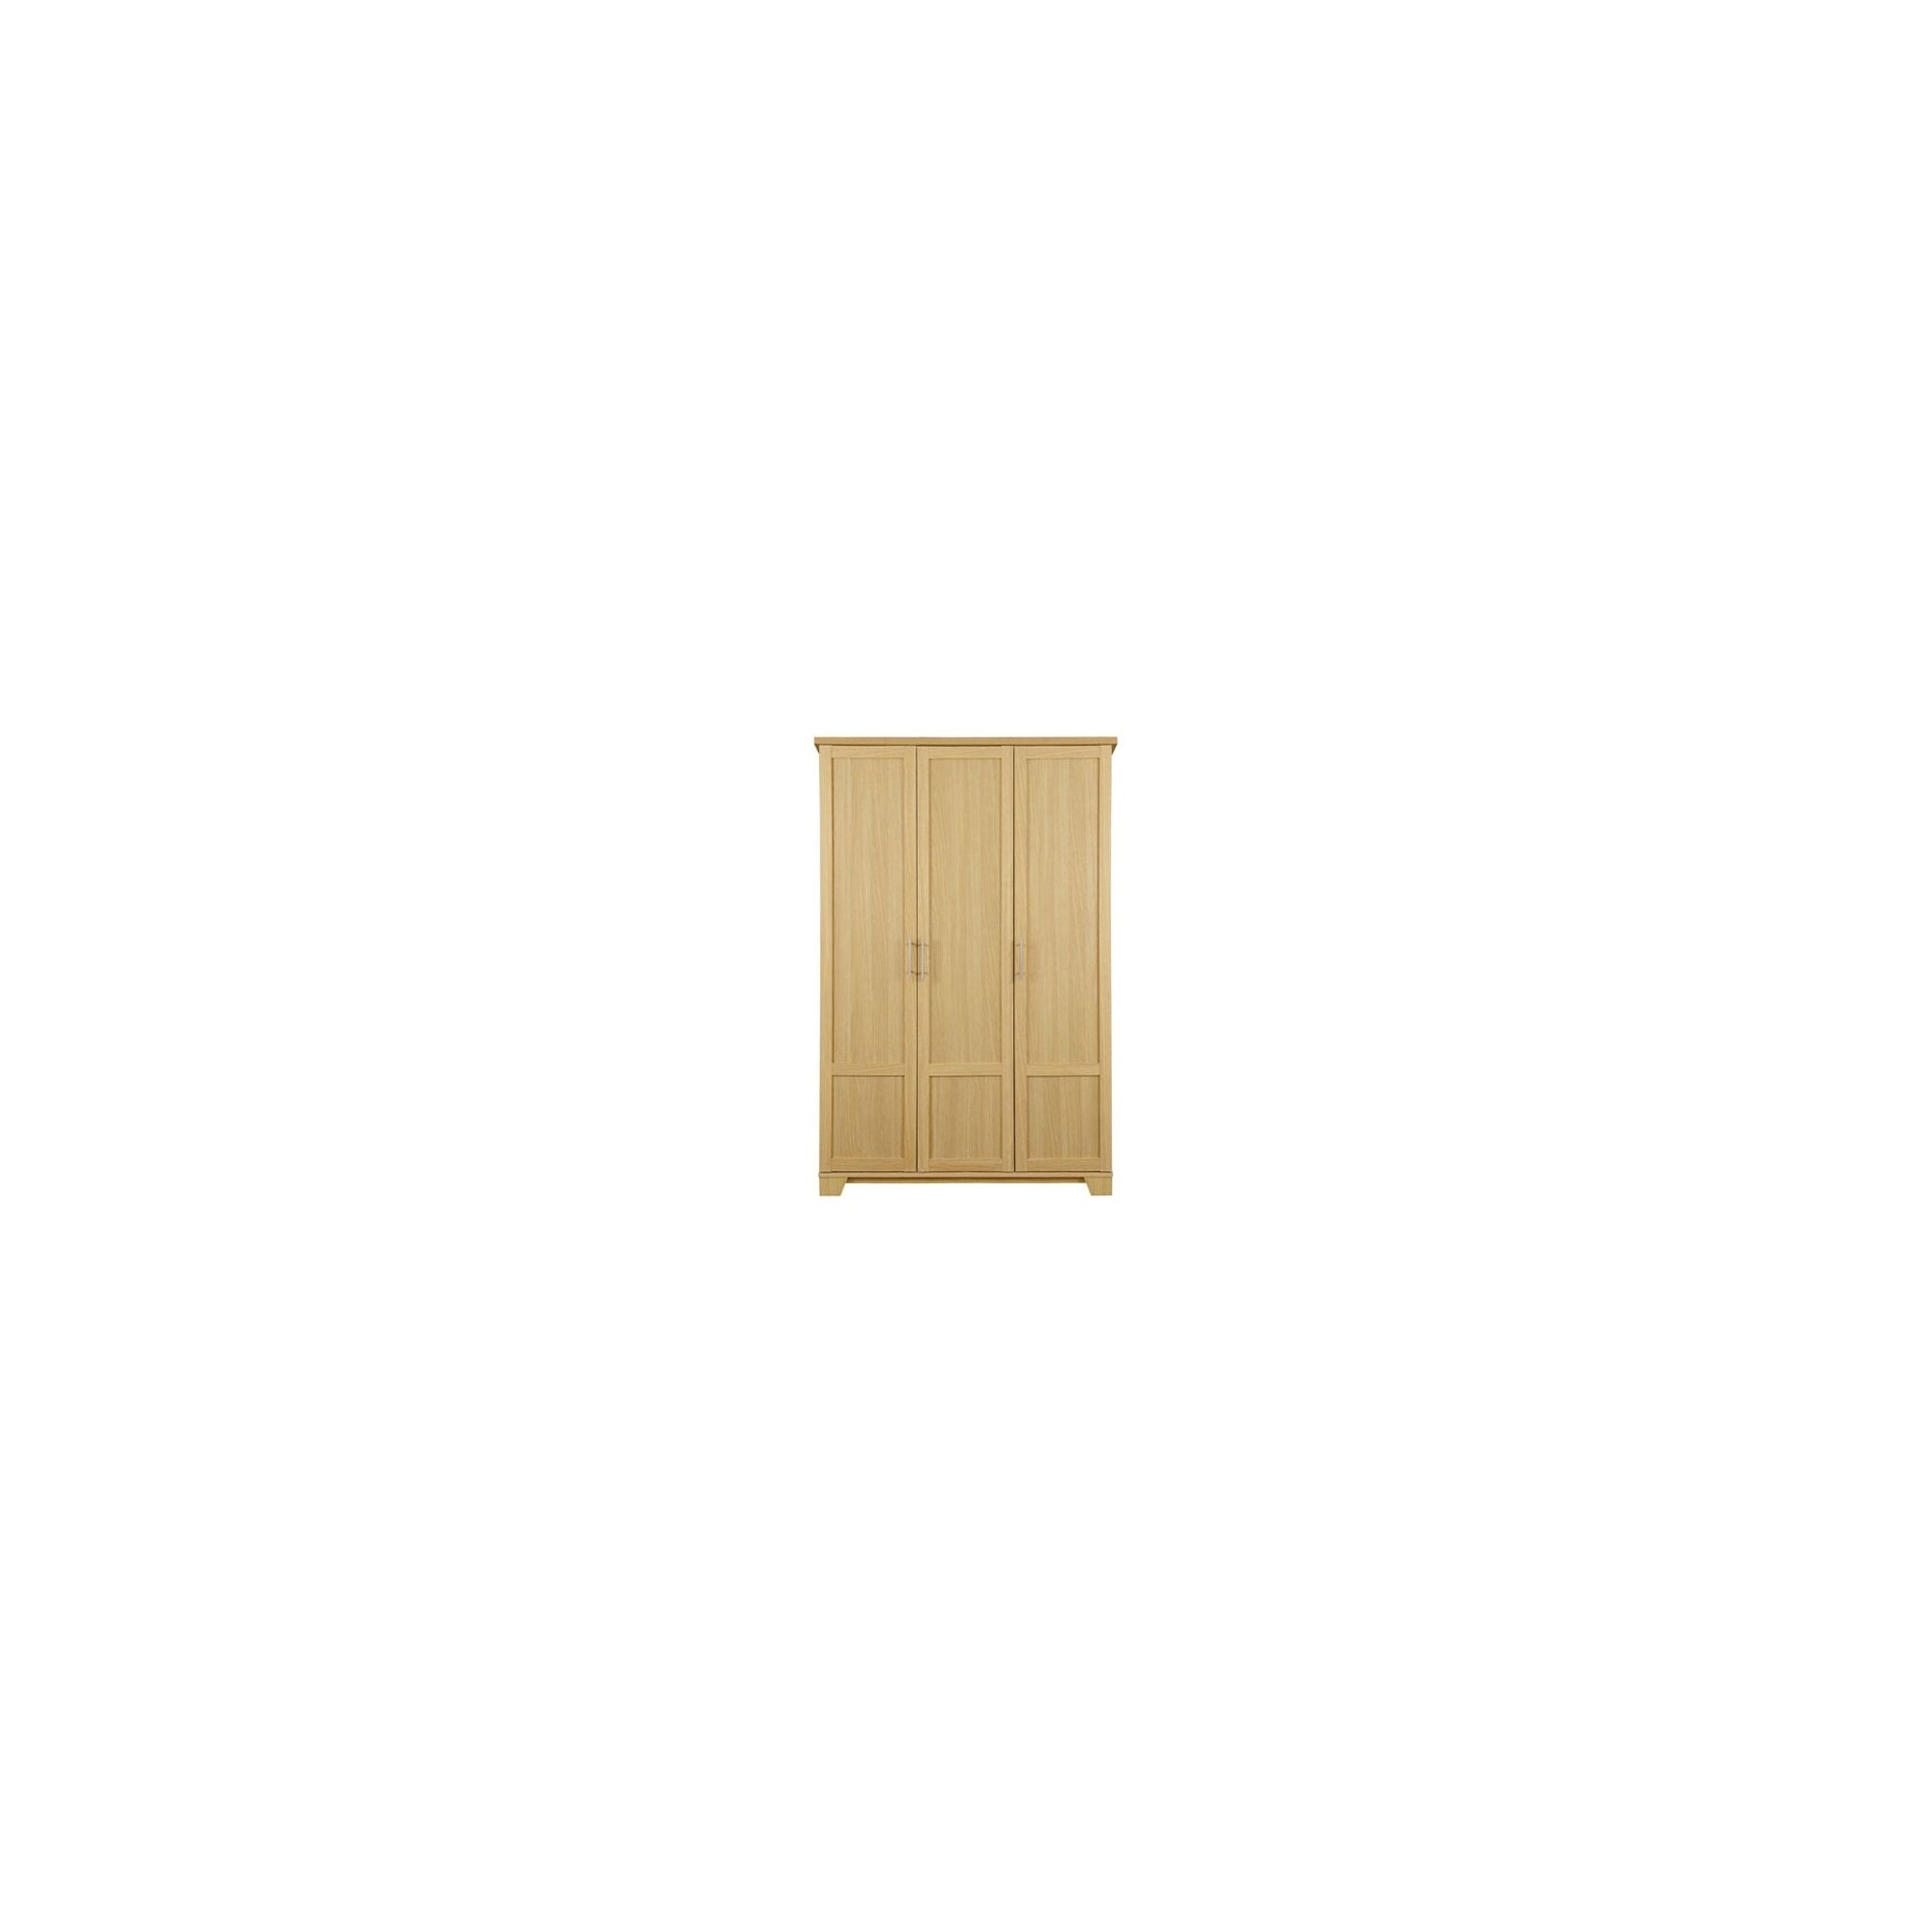 Caxton Melody 3 Door Wardrobe Set in Natural Oak at Tesco Direct